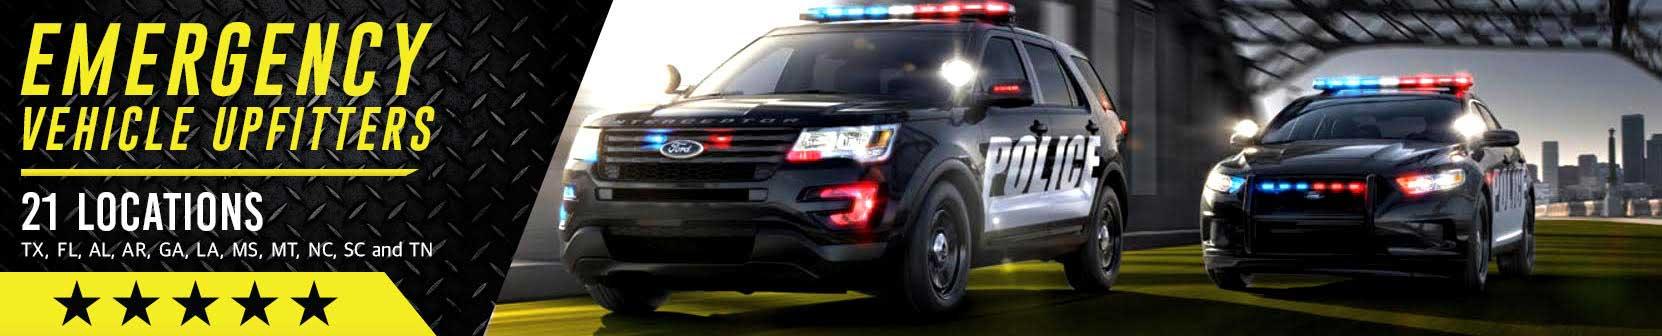 Whelen LED Warning Lights, Soundoff, Code-3 Light Bars, Police Sirens, and Law Enforcement Equipment